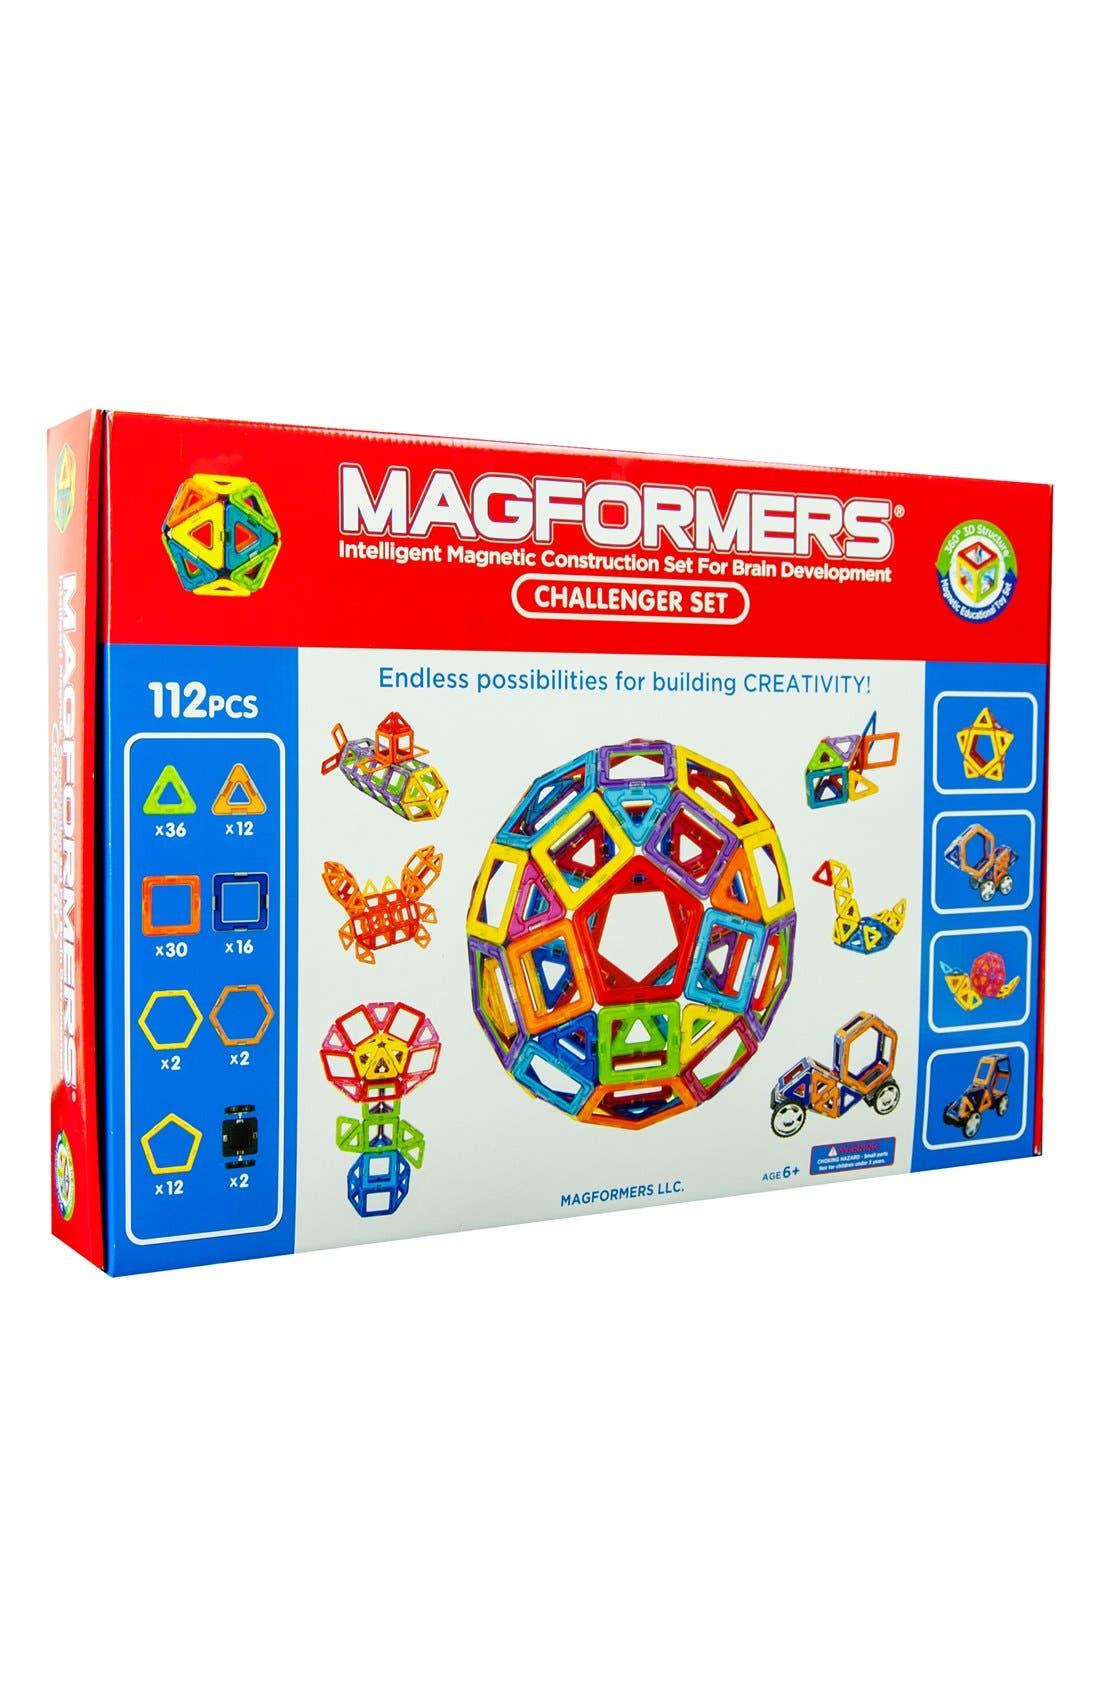 MAGFORMERS 'Challenger' Construction Set